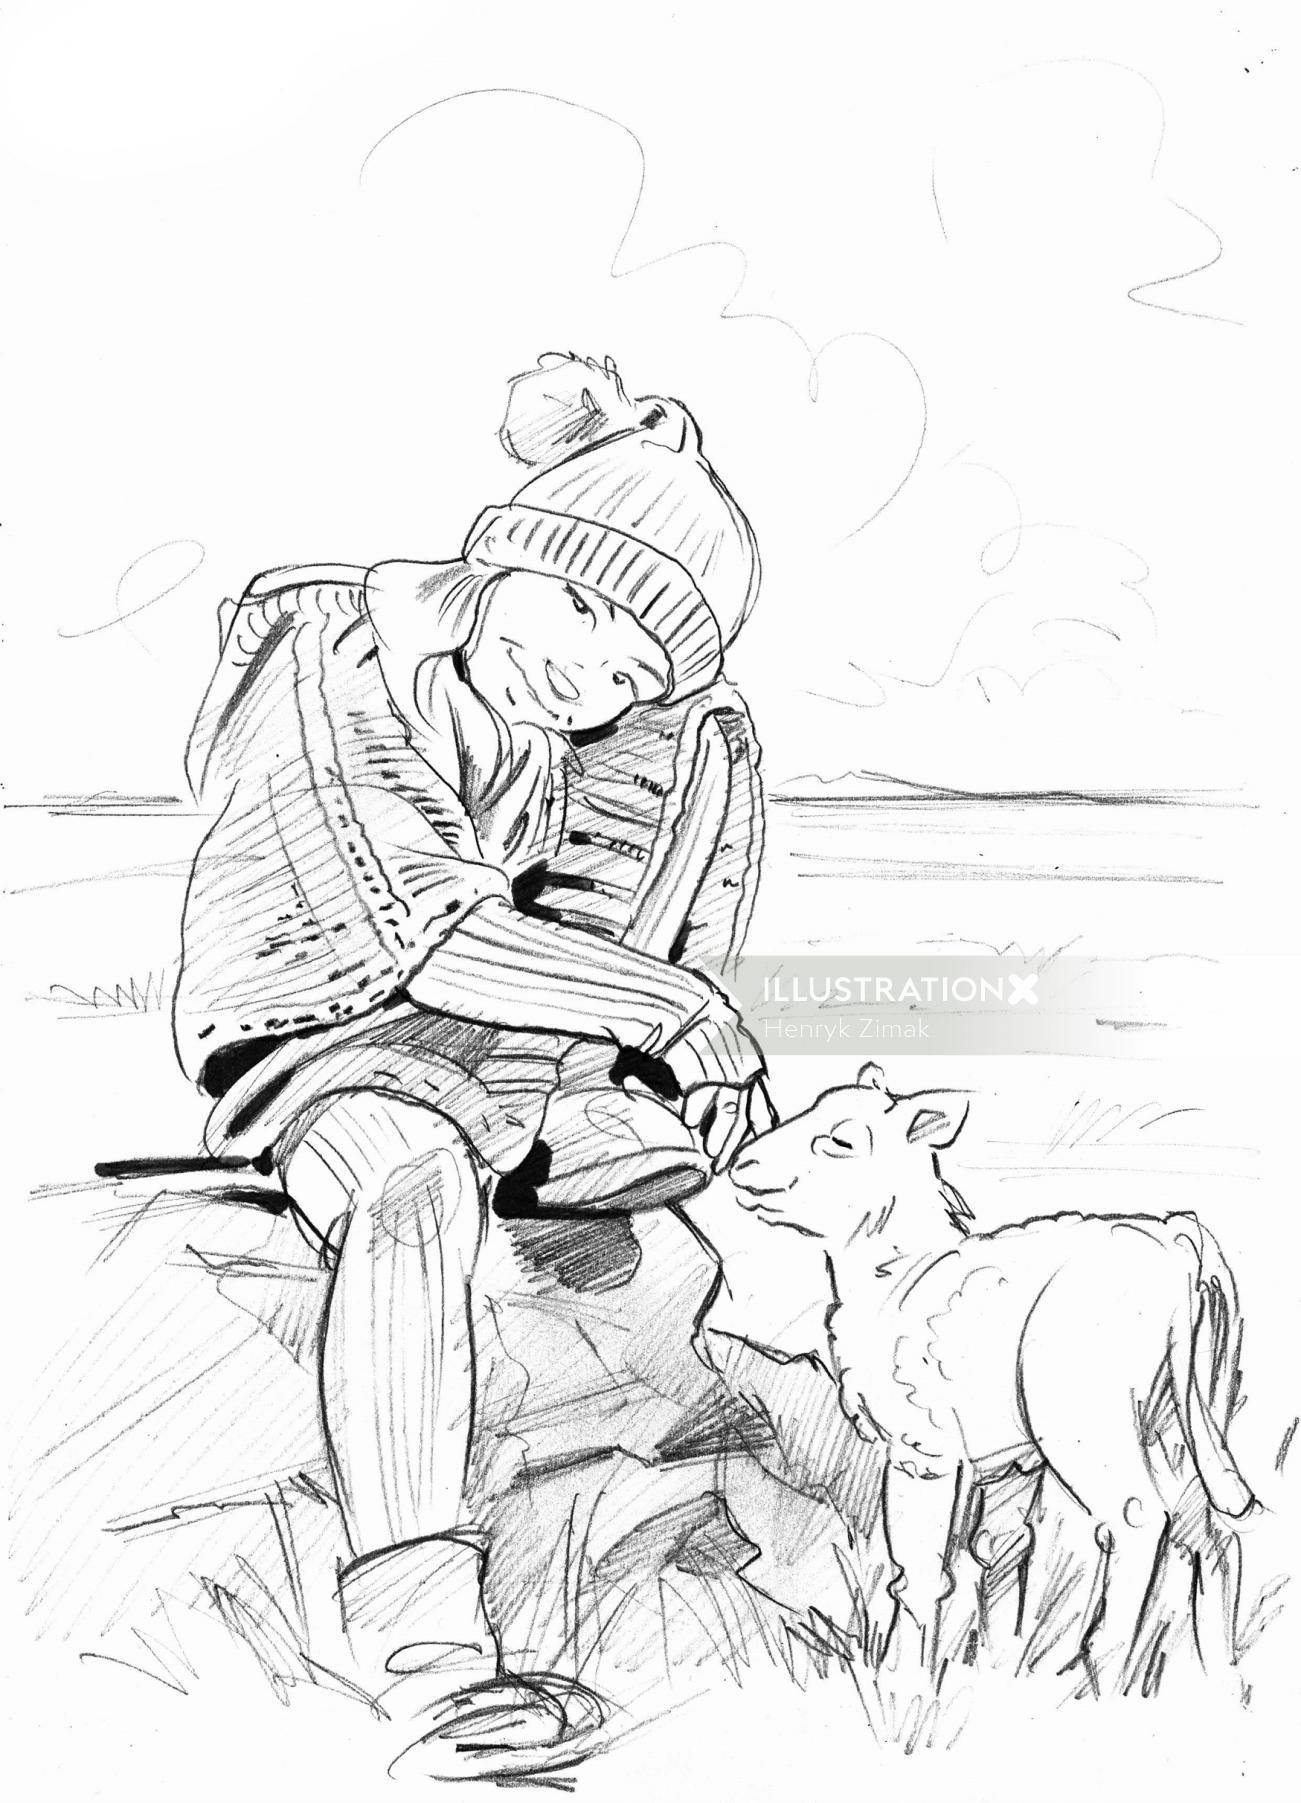 Sketch art of small boy